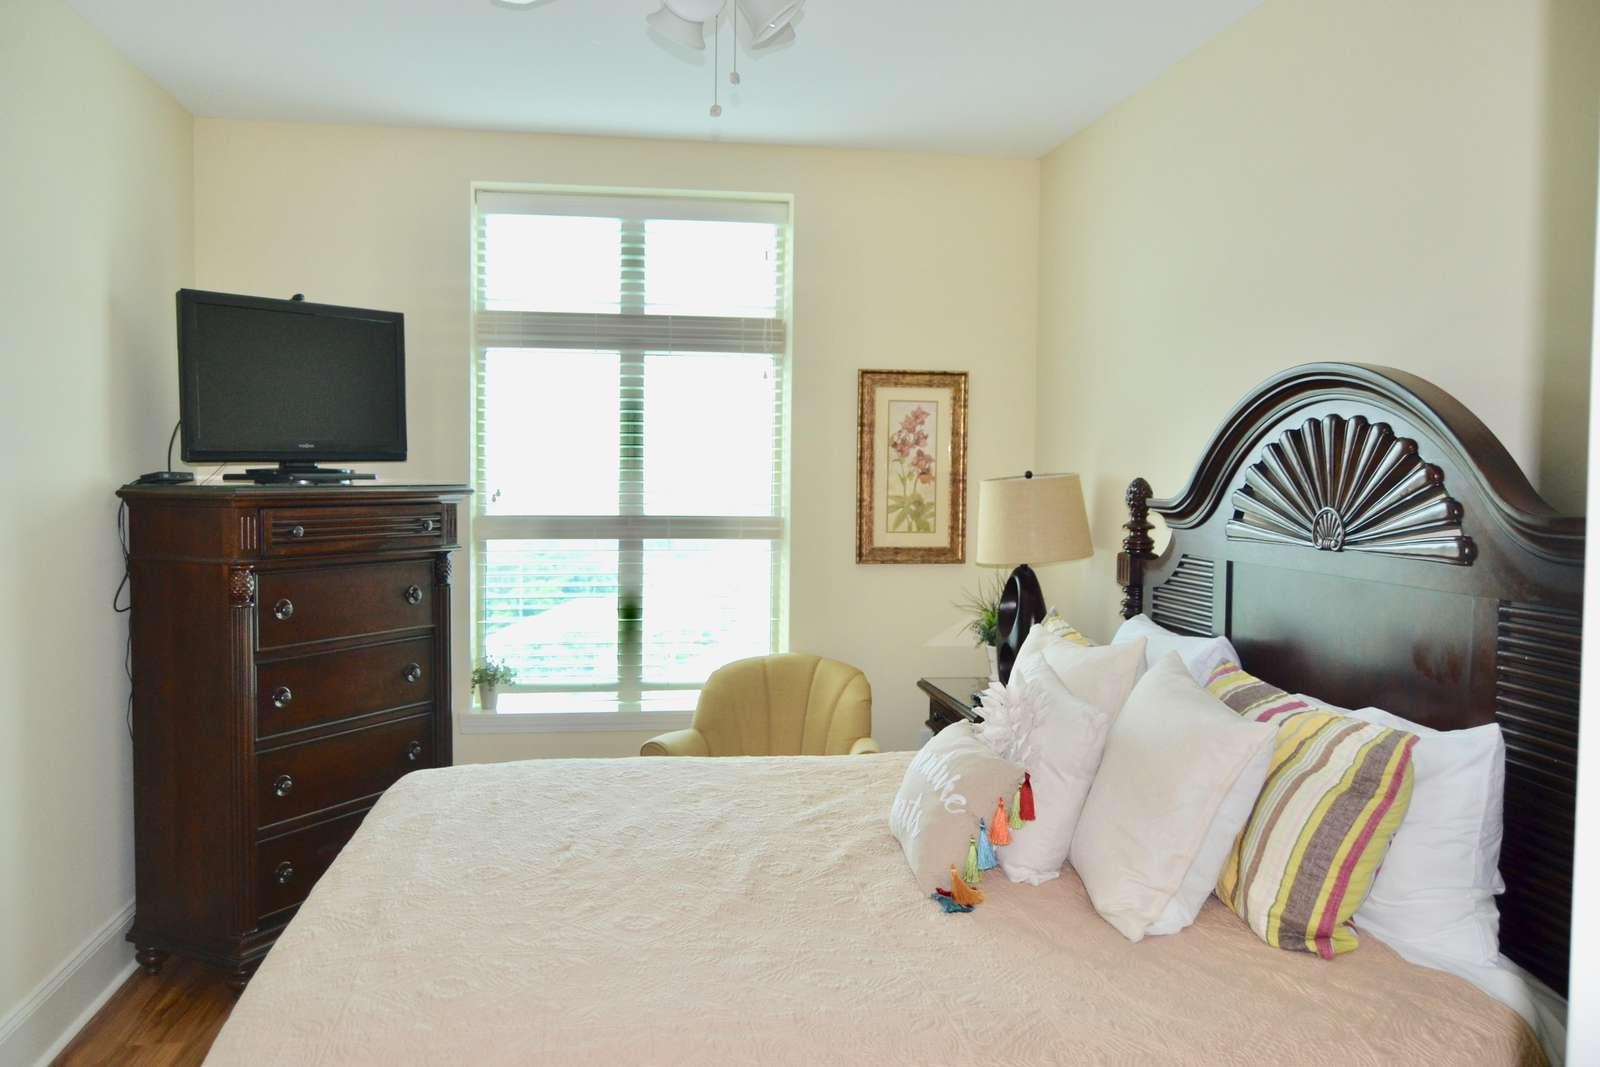 Guest bedroom 1, Flat screen TV